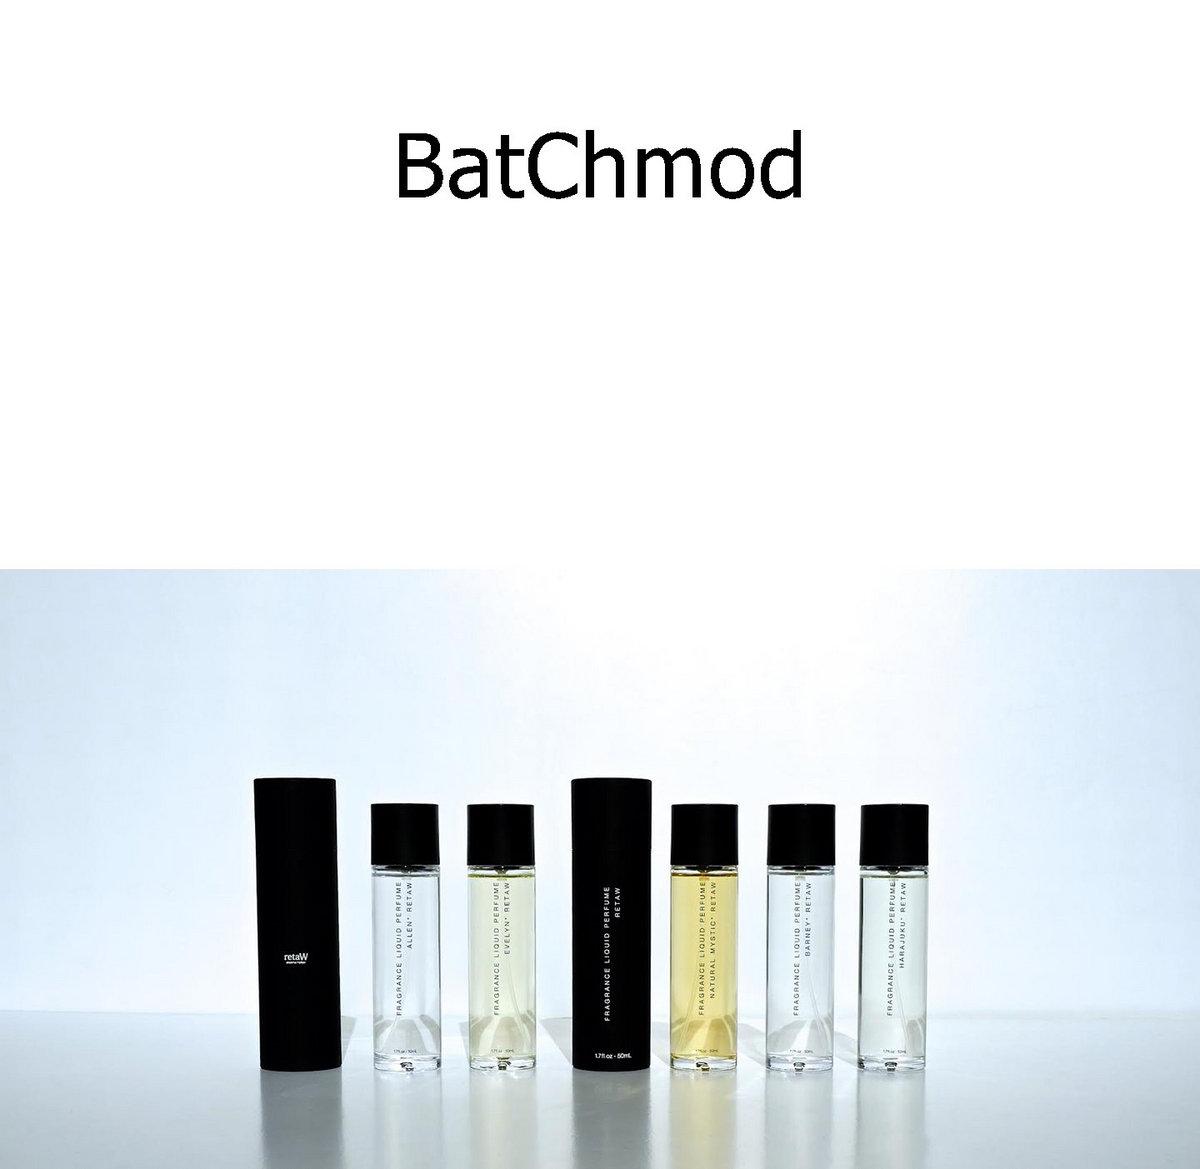 BatChmod